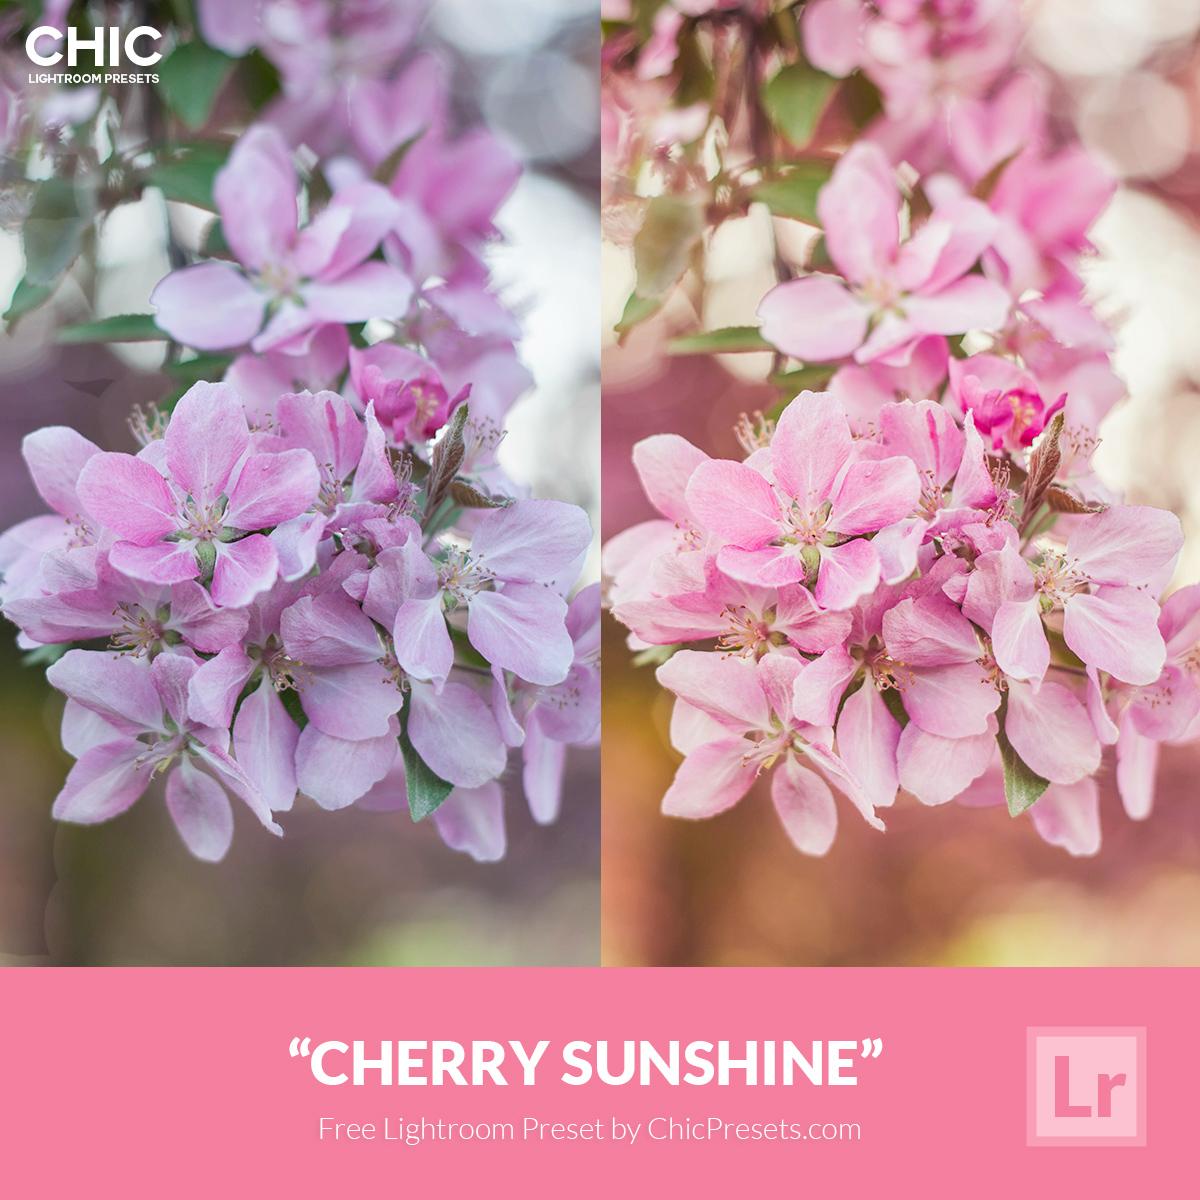 Chic-Presets---Cherry-Sunshine-Free-Preset